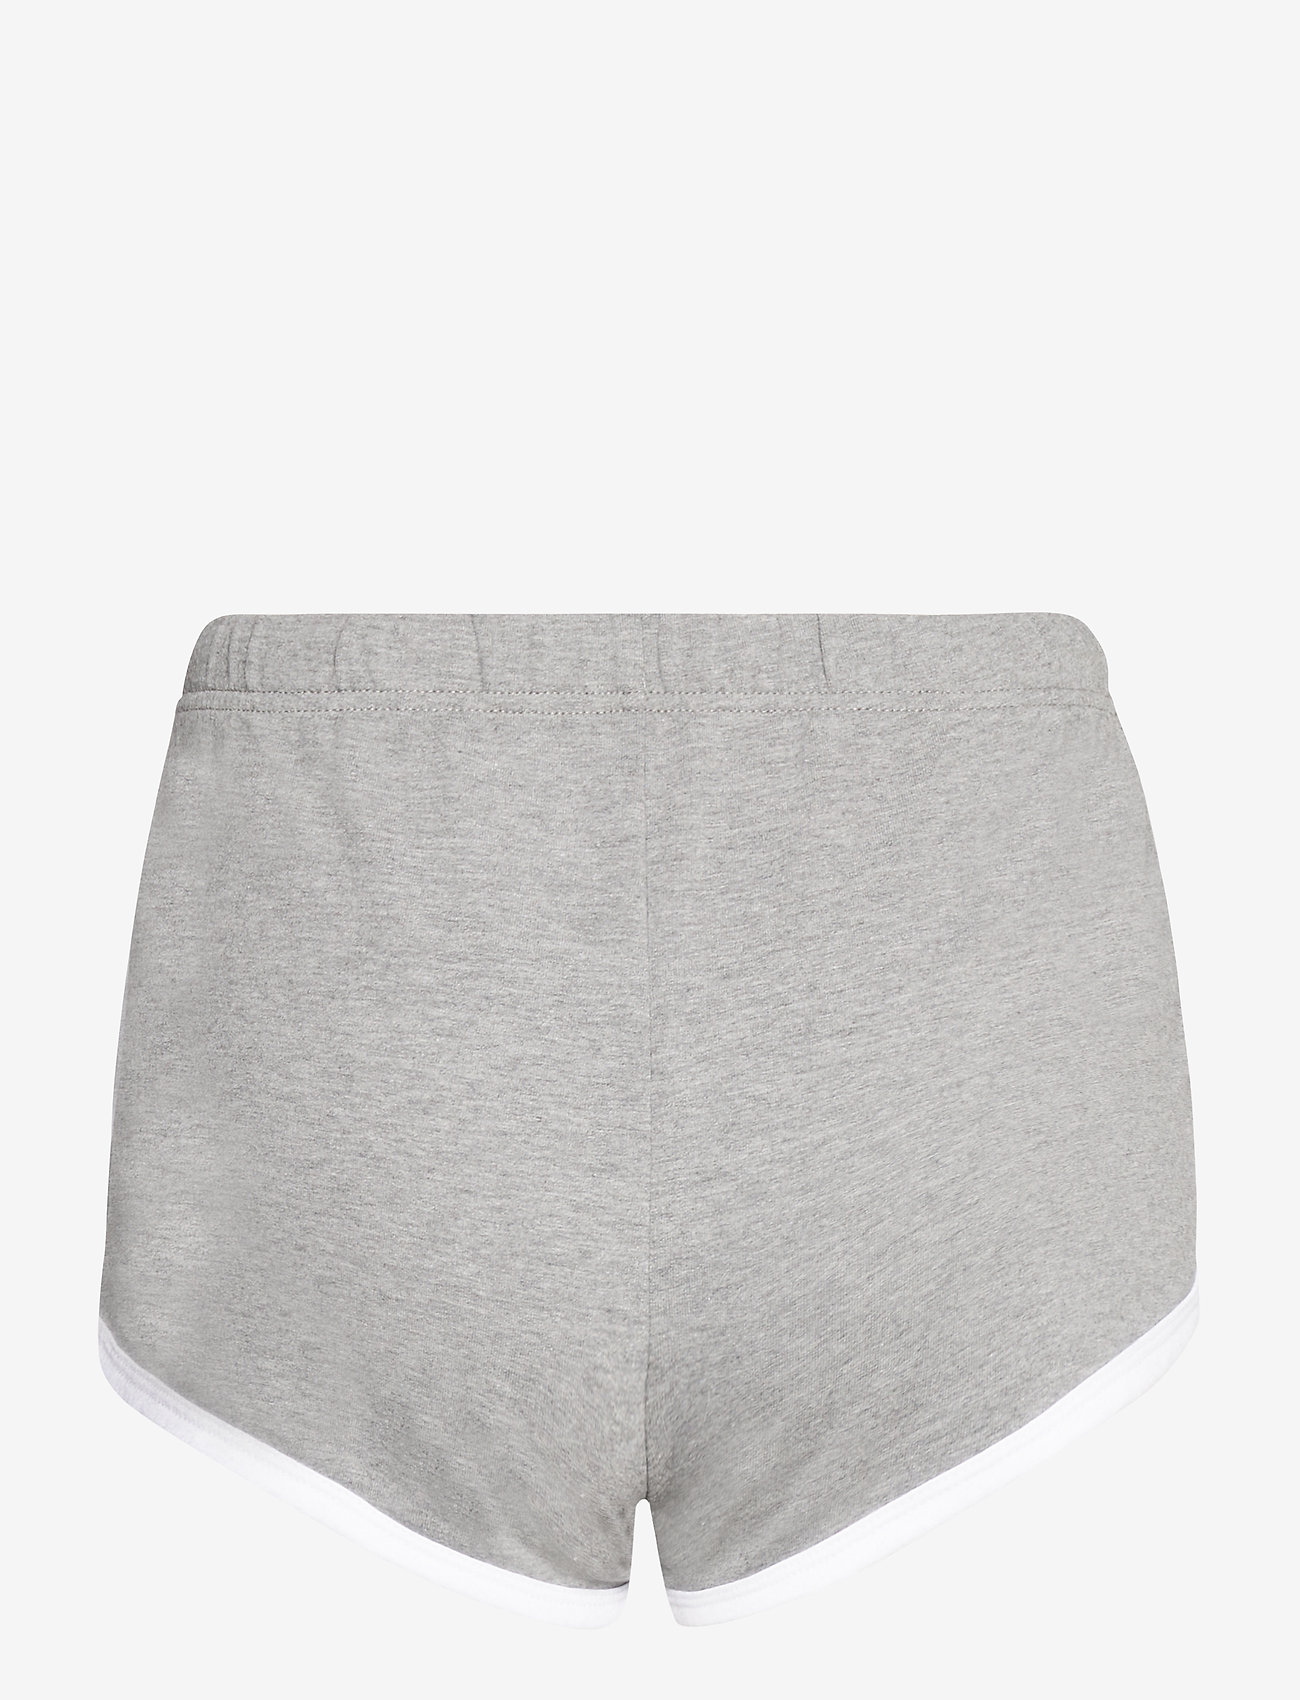 Hollister - HCo. GIRLS SHORTS - shorts casual - grey - 1